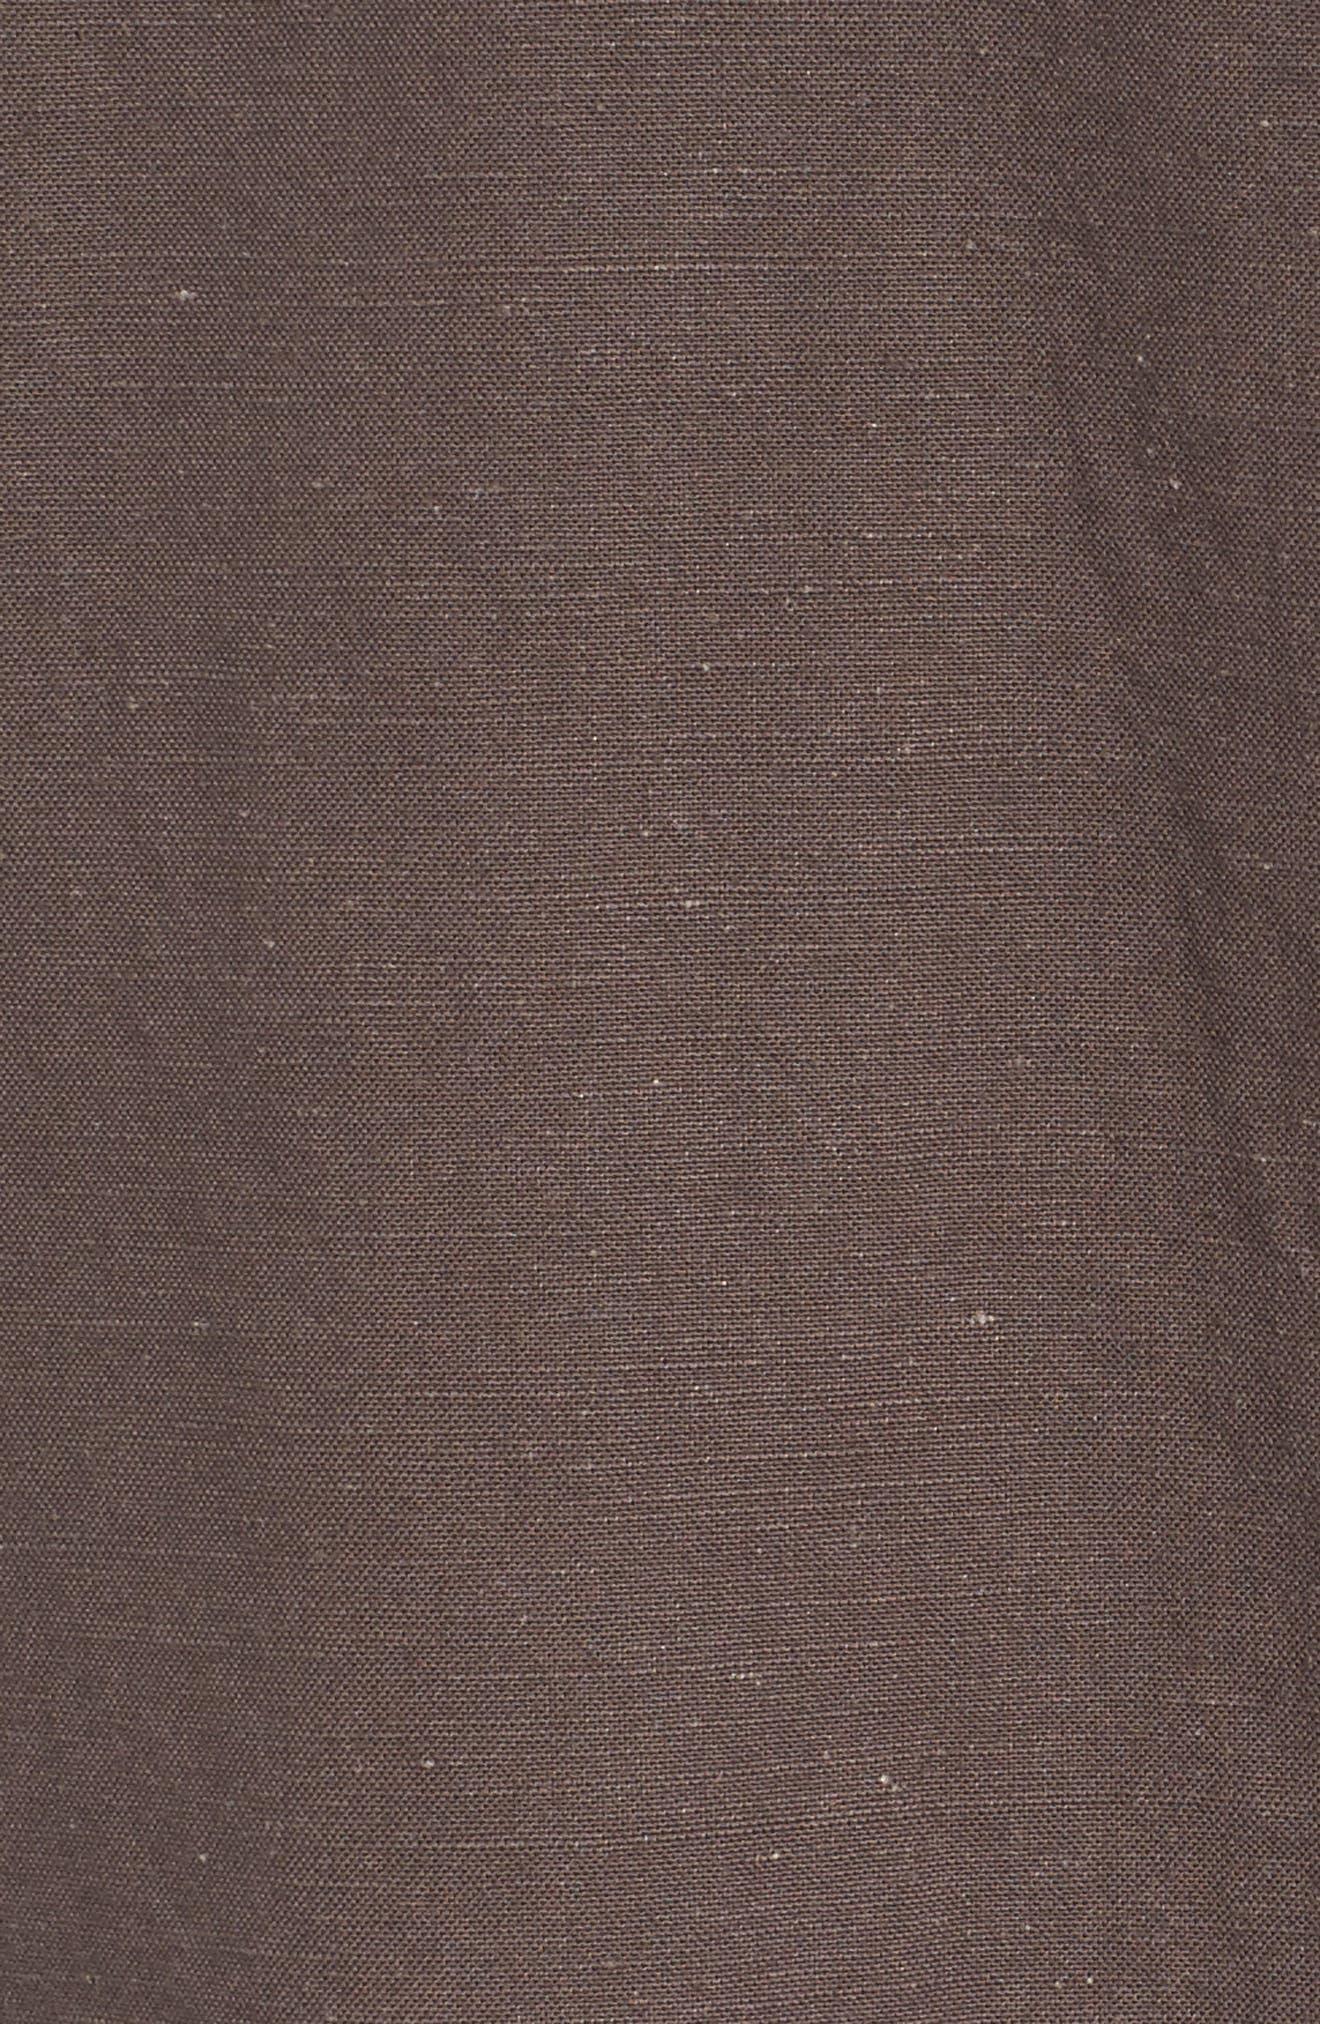 Organic Cotton & Hemp Jacket,                             Alternate thumbnail 6, color,                             024